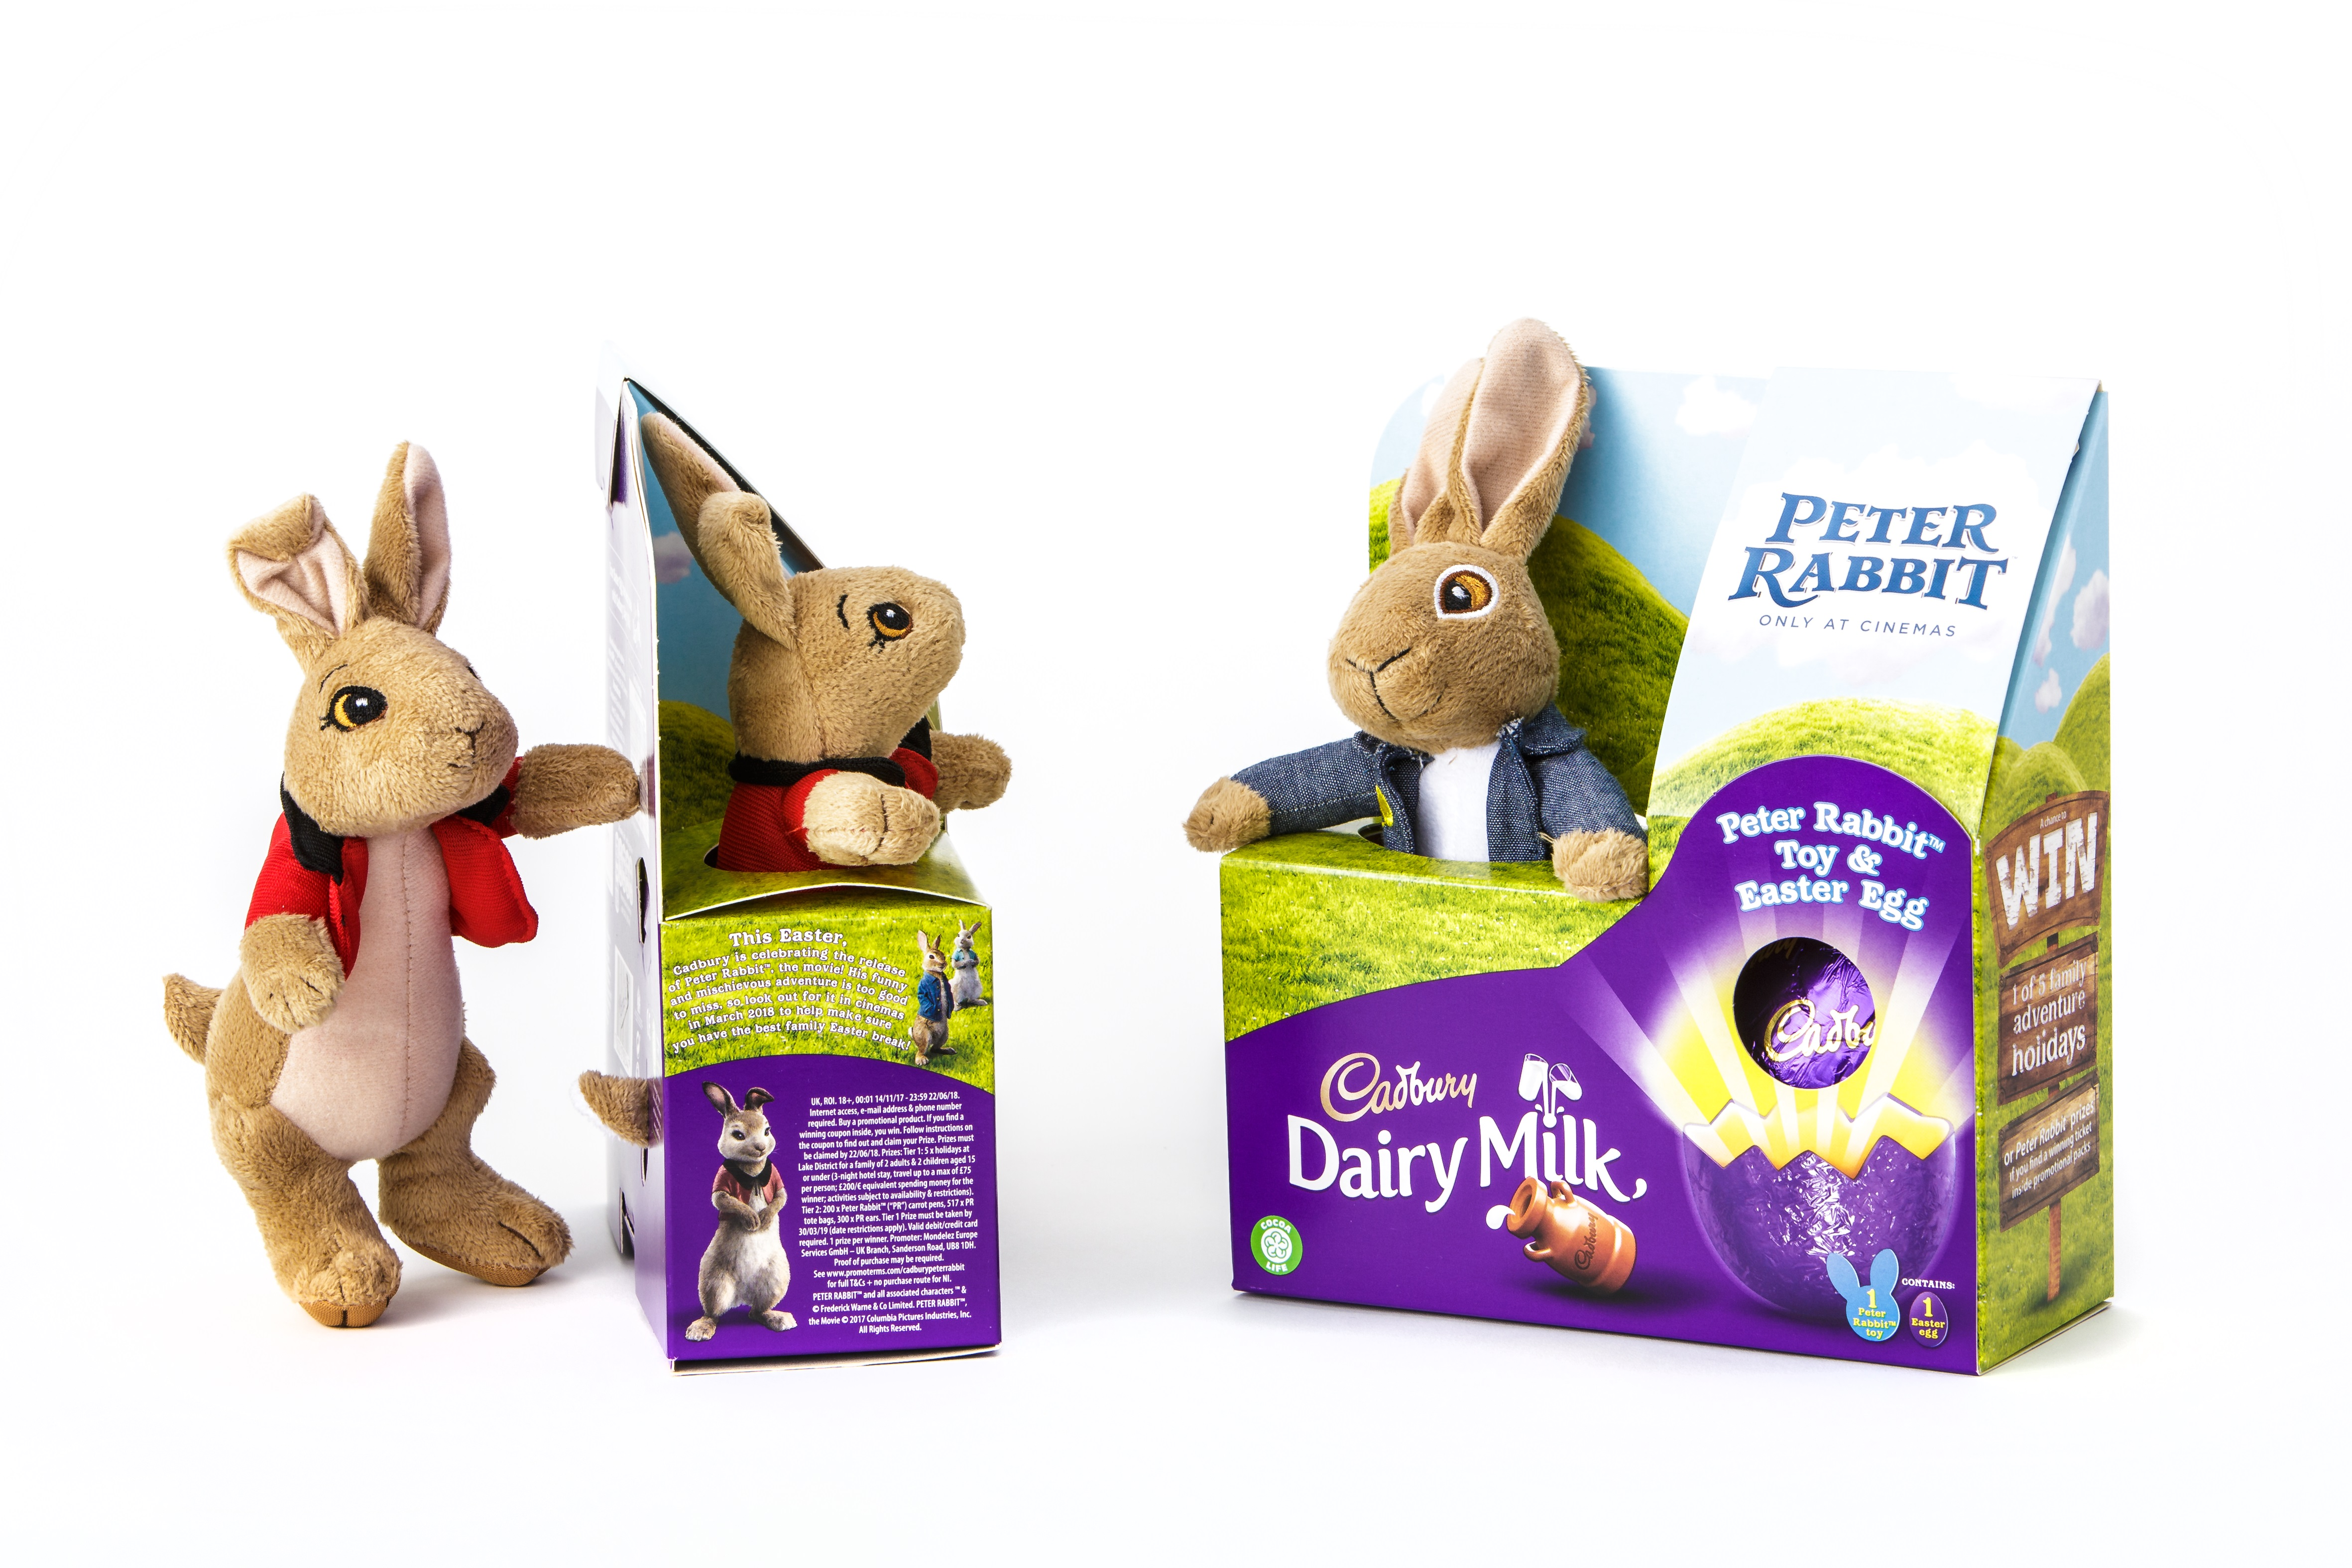 Cadbury Egg carton with toy